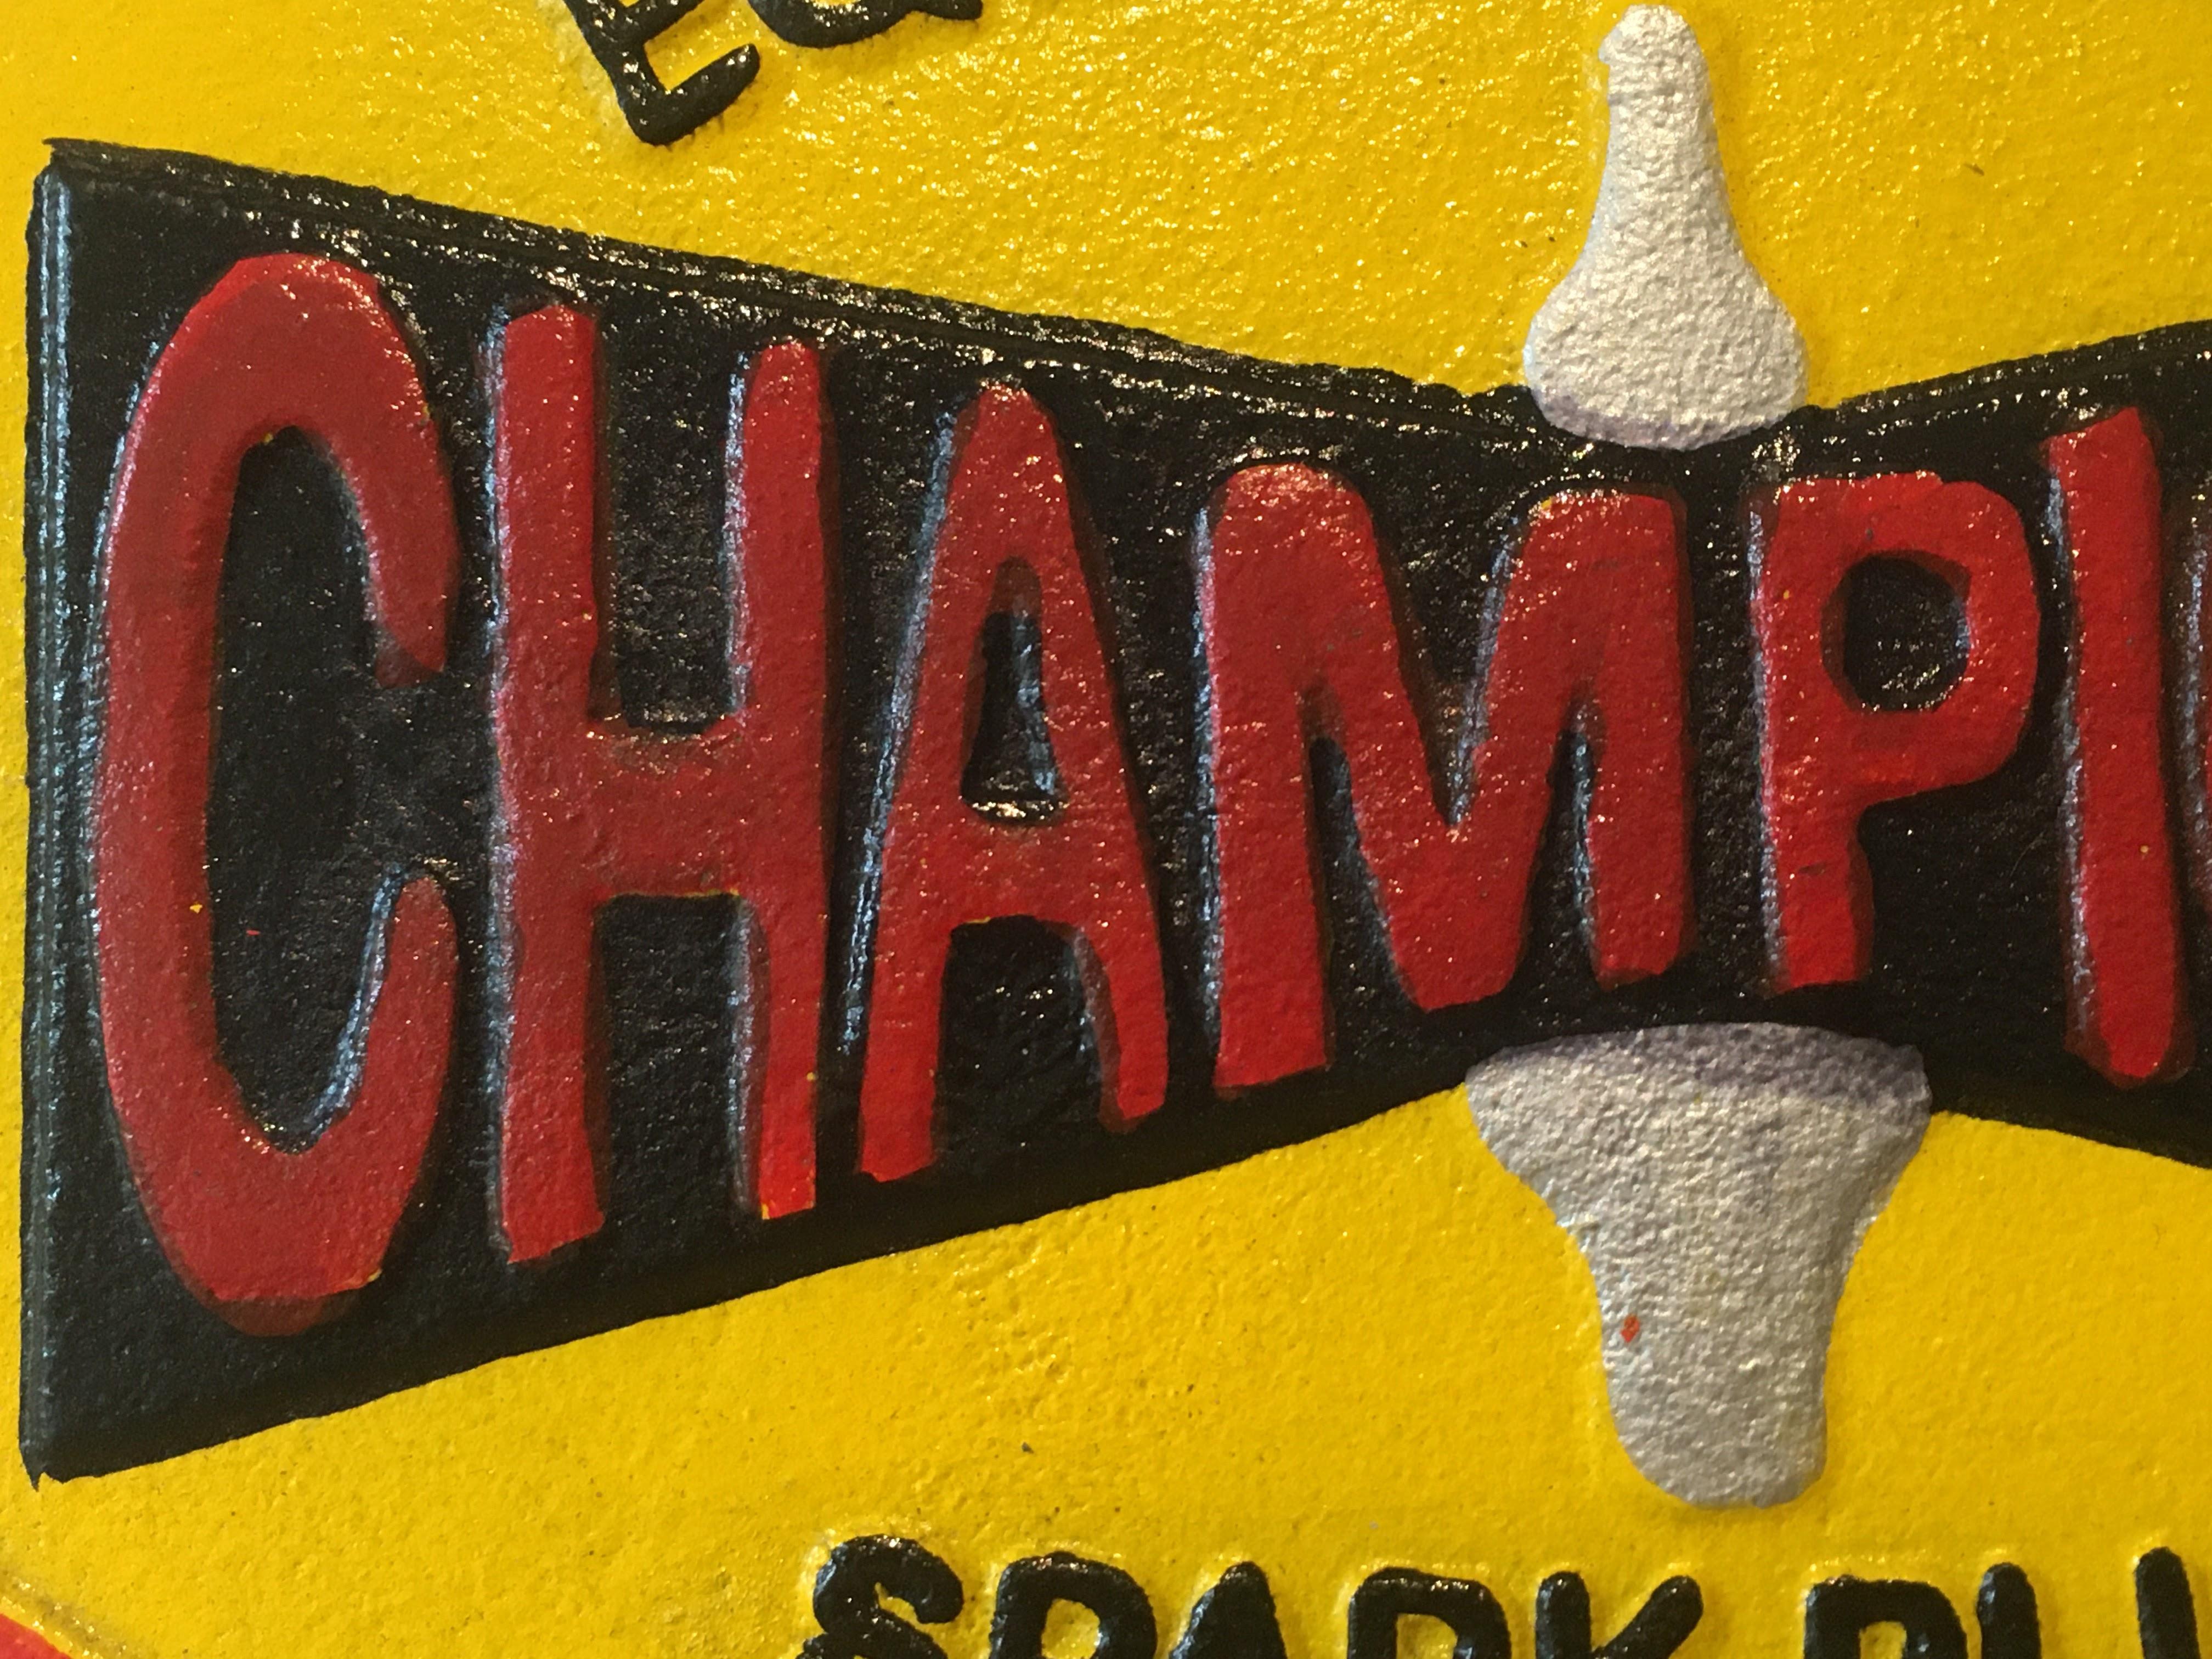 Champion 'Spark Plugs' Cast Iron Sign - Image 4 of 6